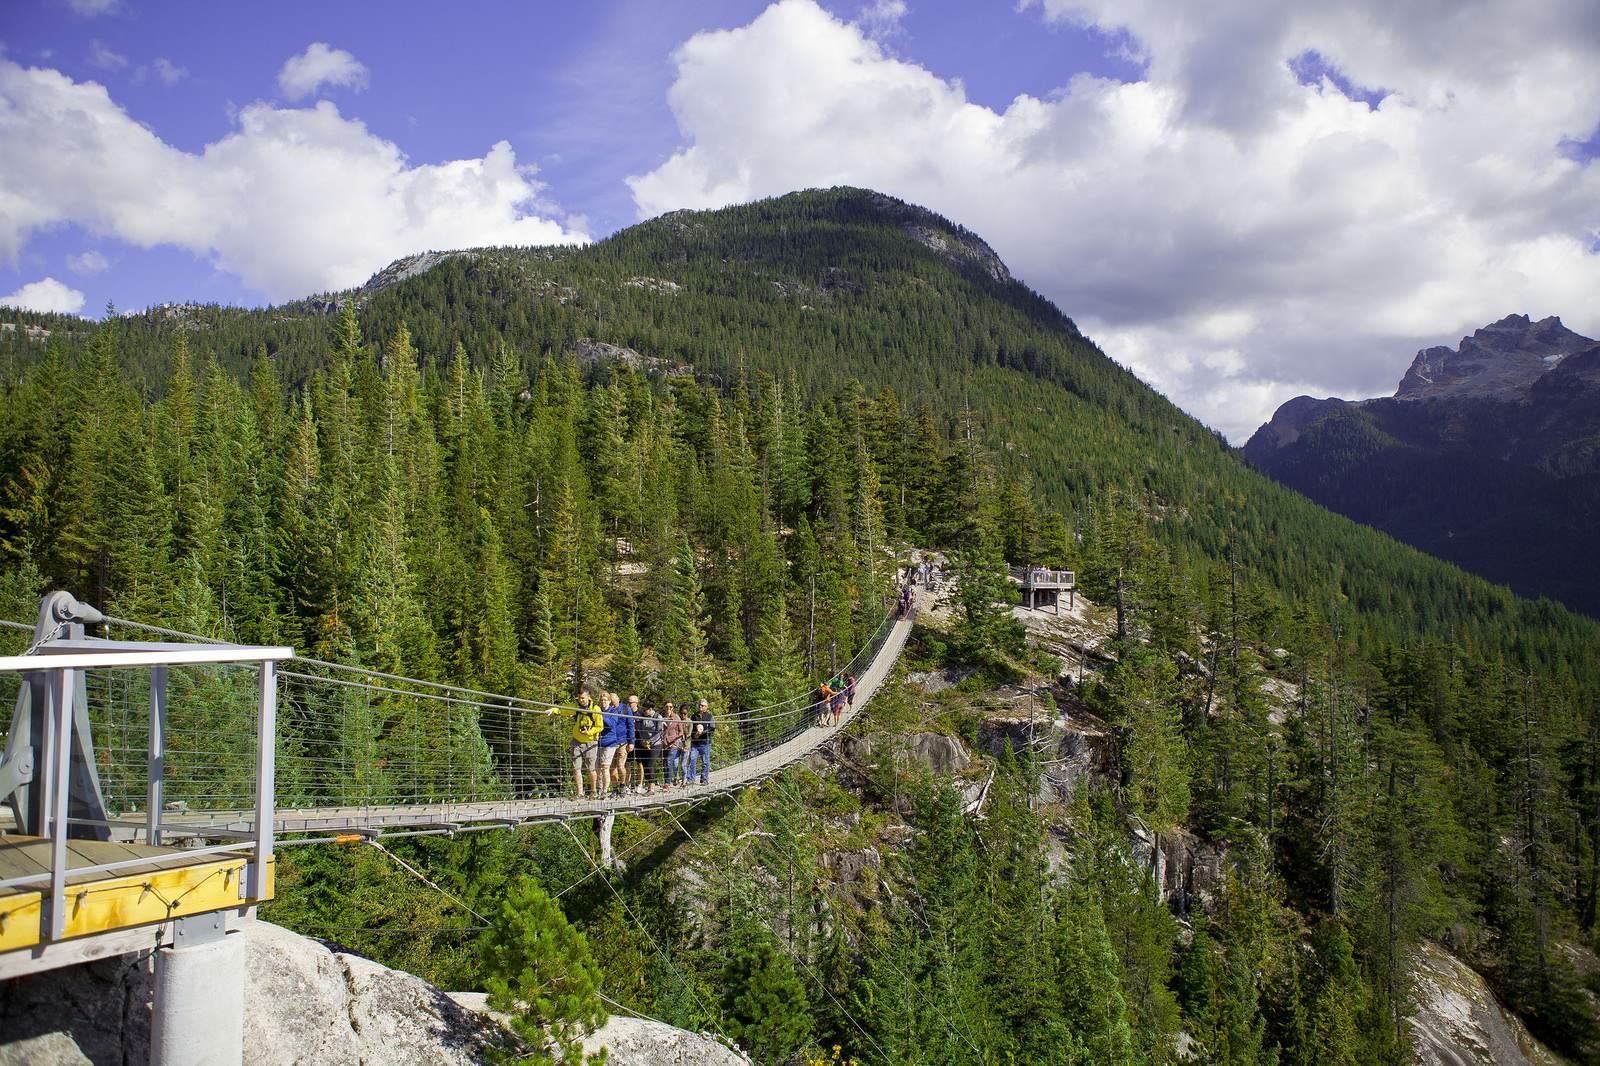 sea to sky gondola4 Sea to Sky Gondola Halfway Between Vancouver and Whistler